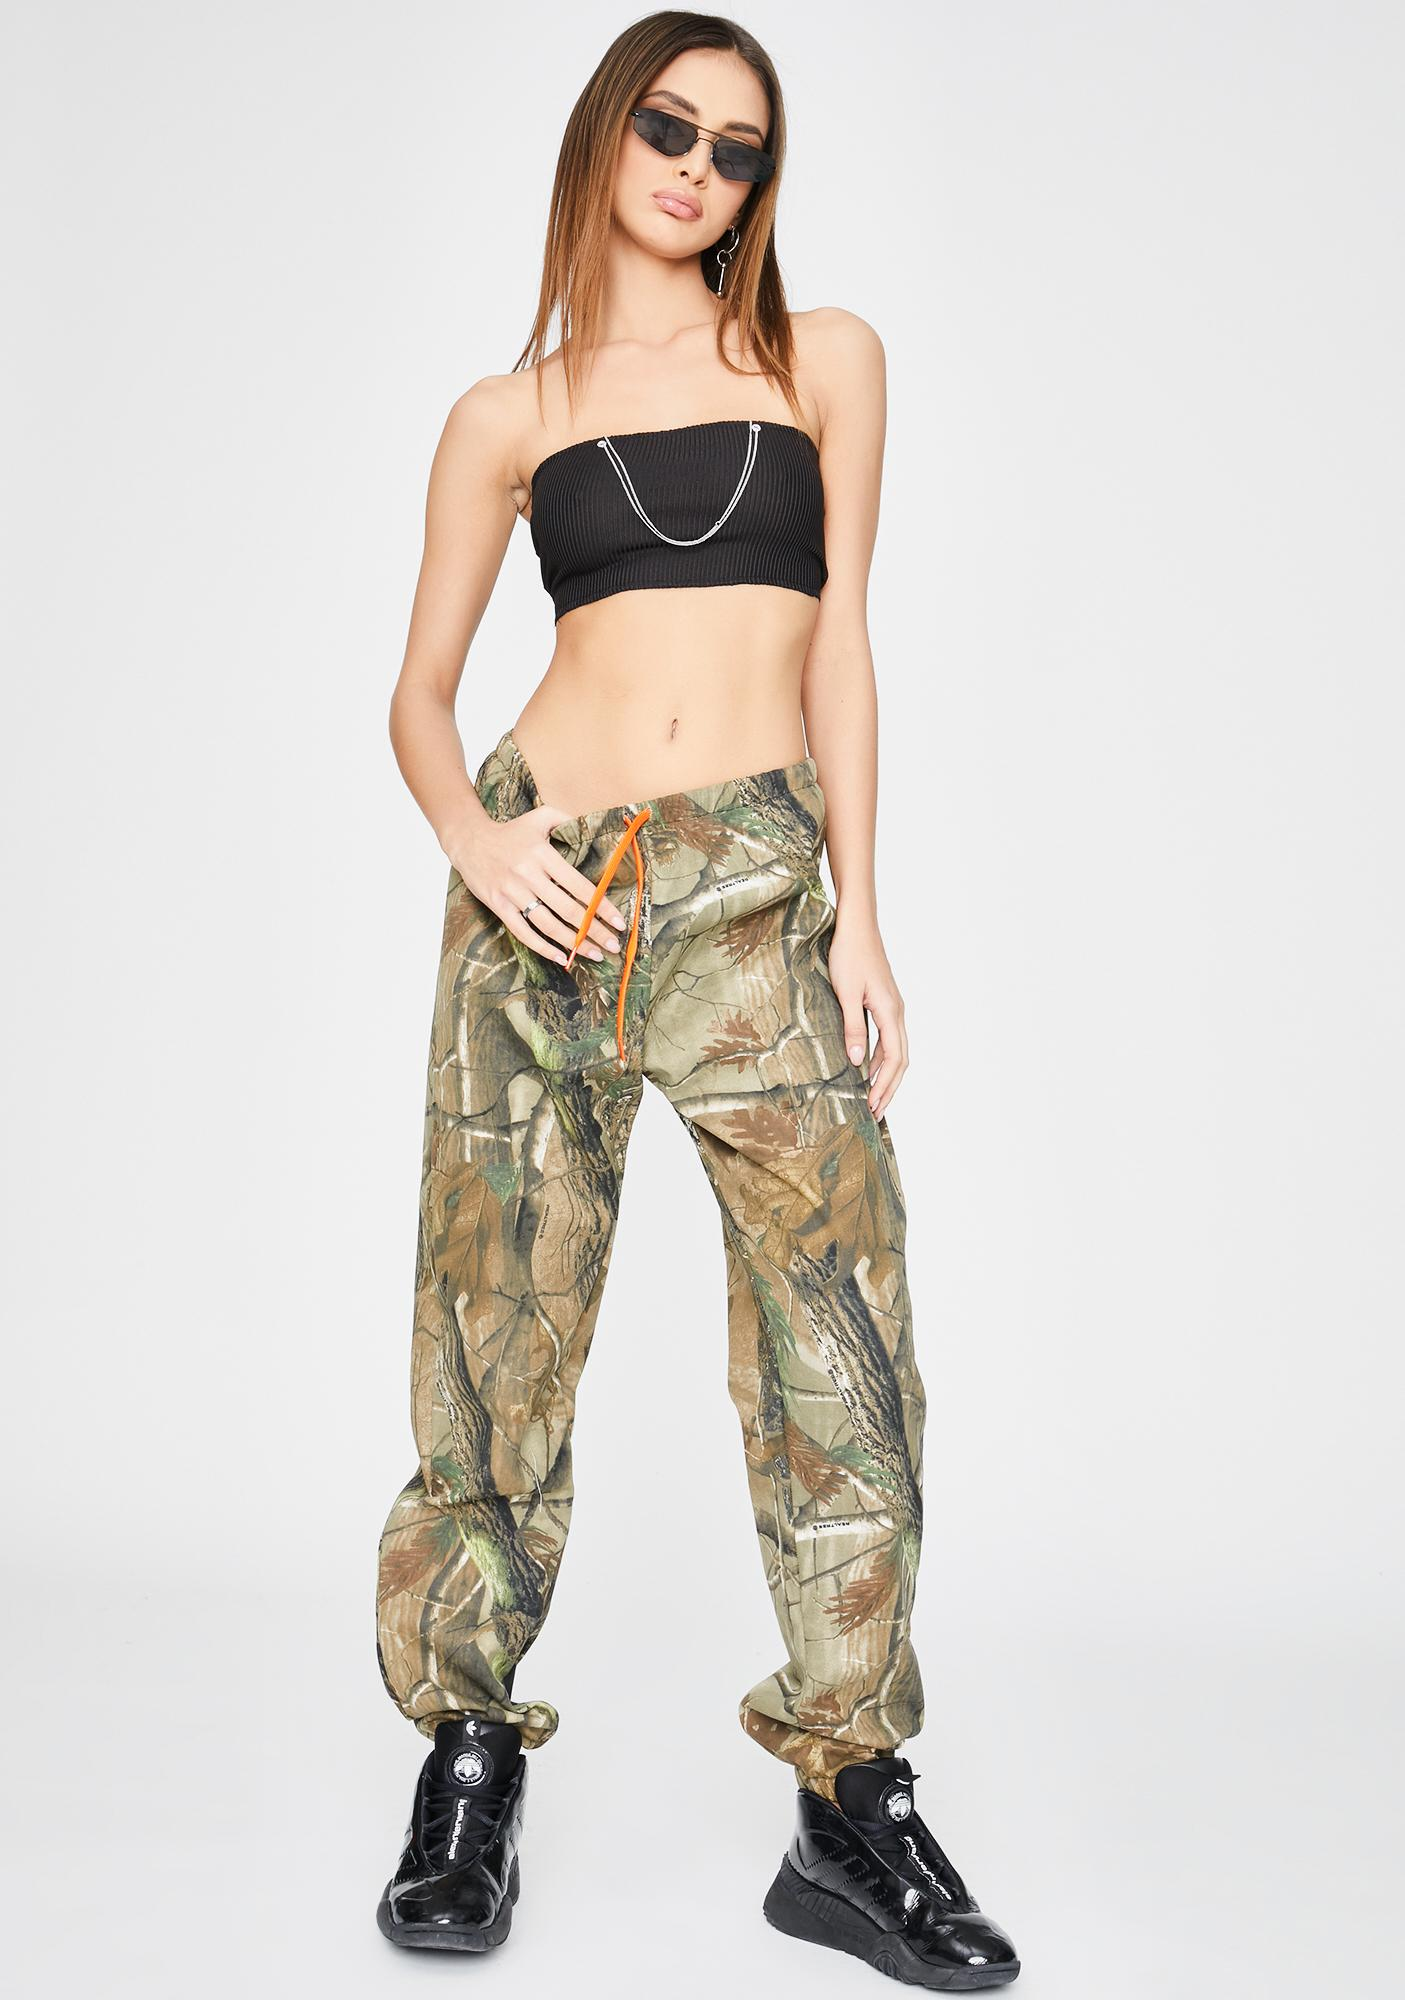 Riccetti Clothing Chain Tube Top